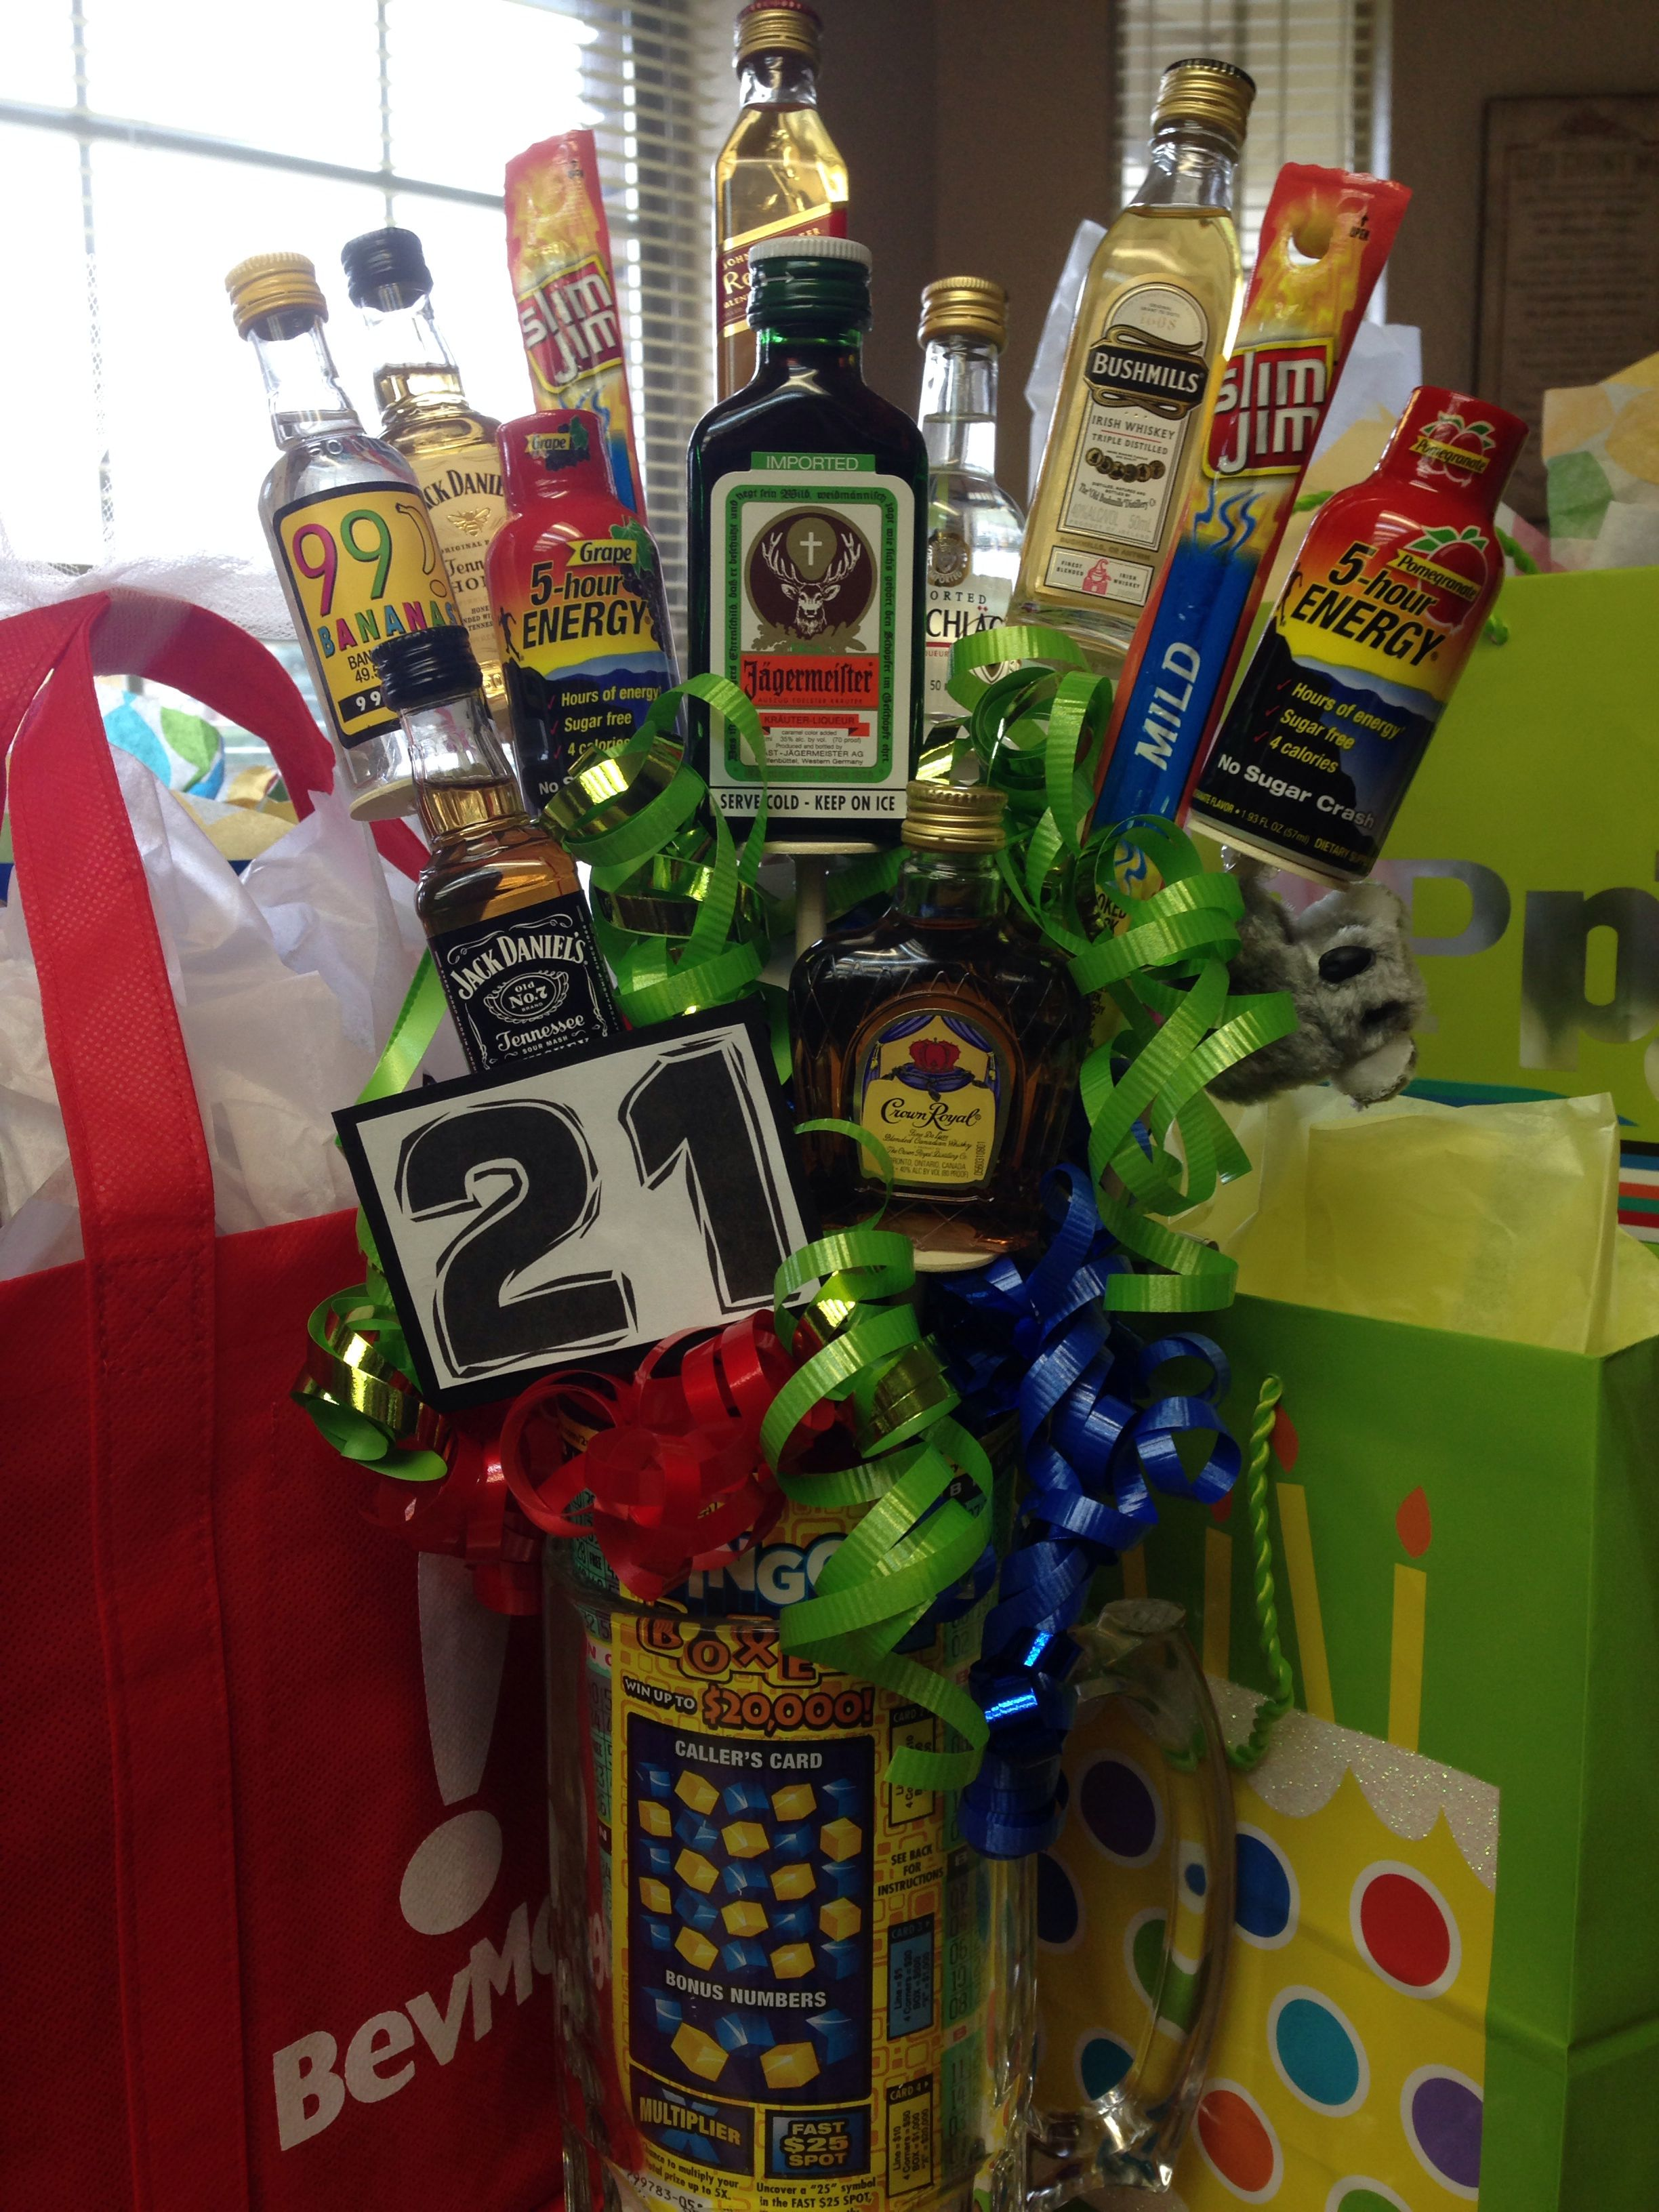 21st birthday gift for